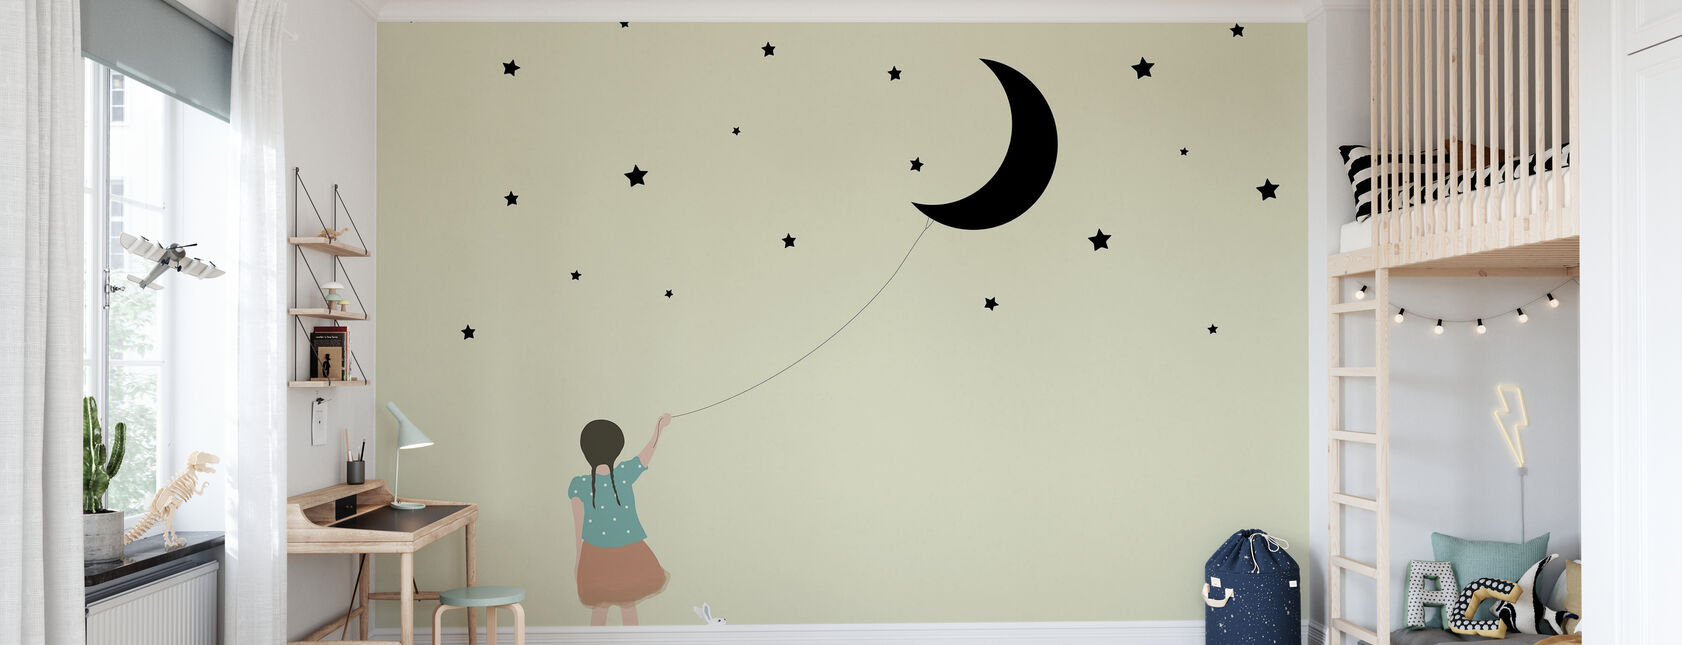 Stars and moon - Wallpaper - Kids Room